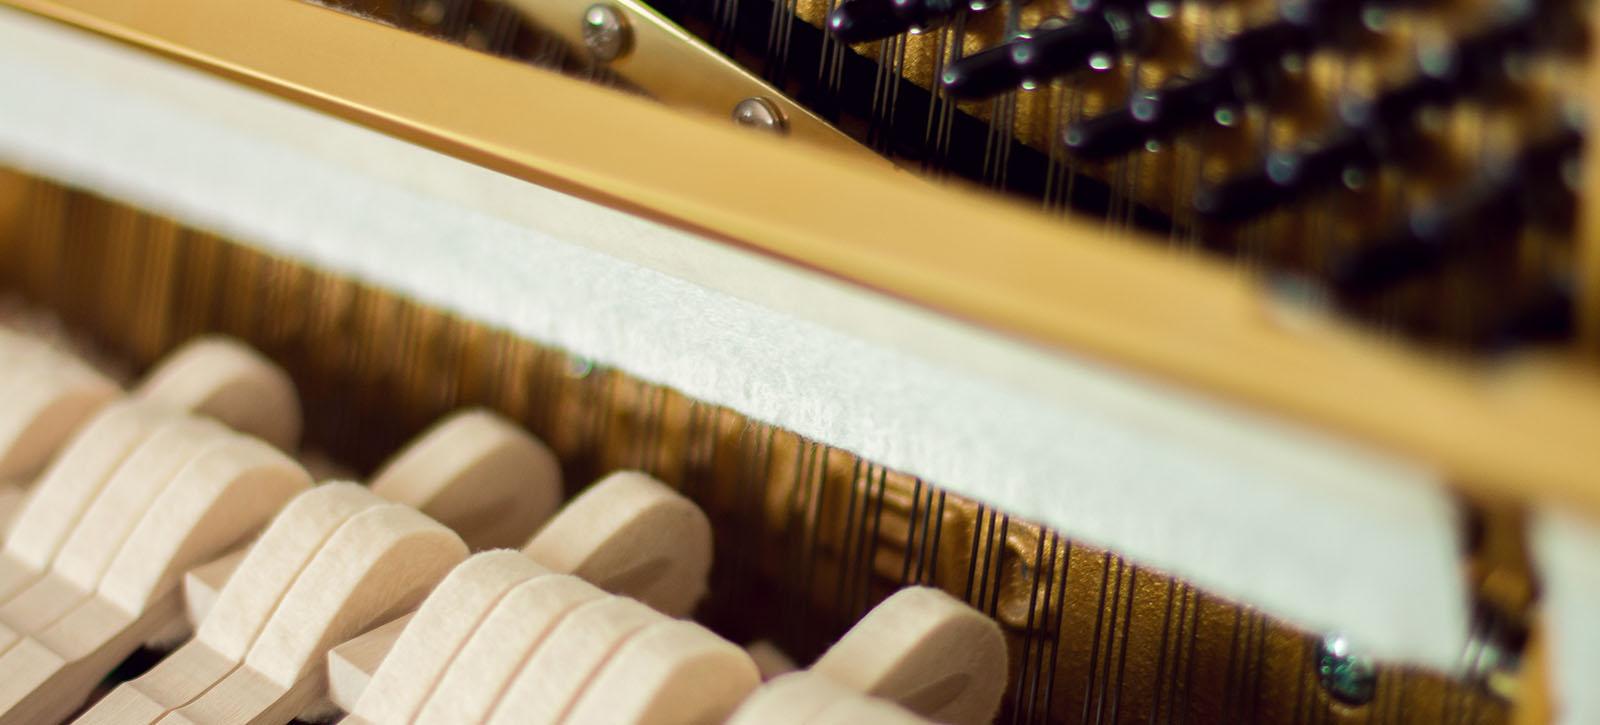 Inside a piano.